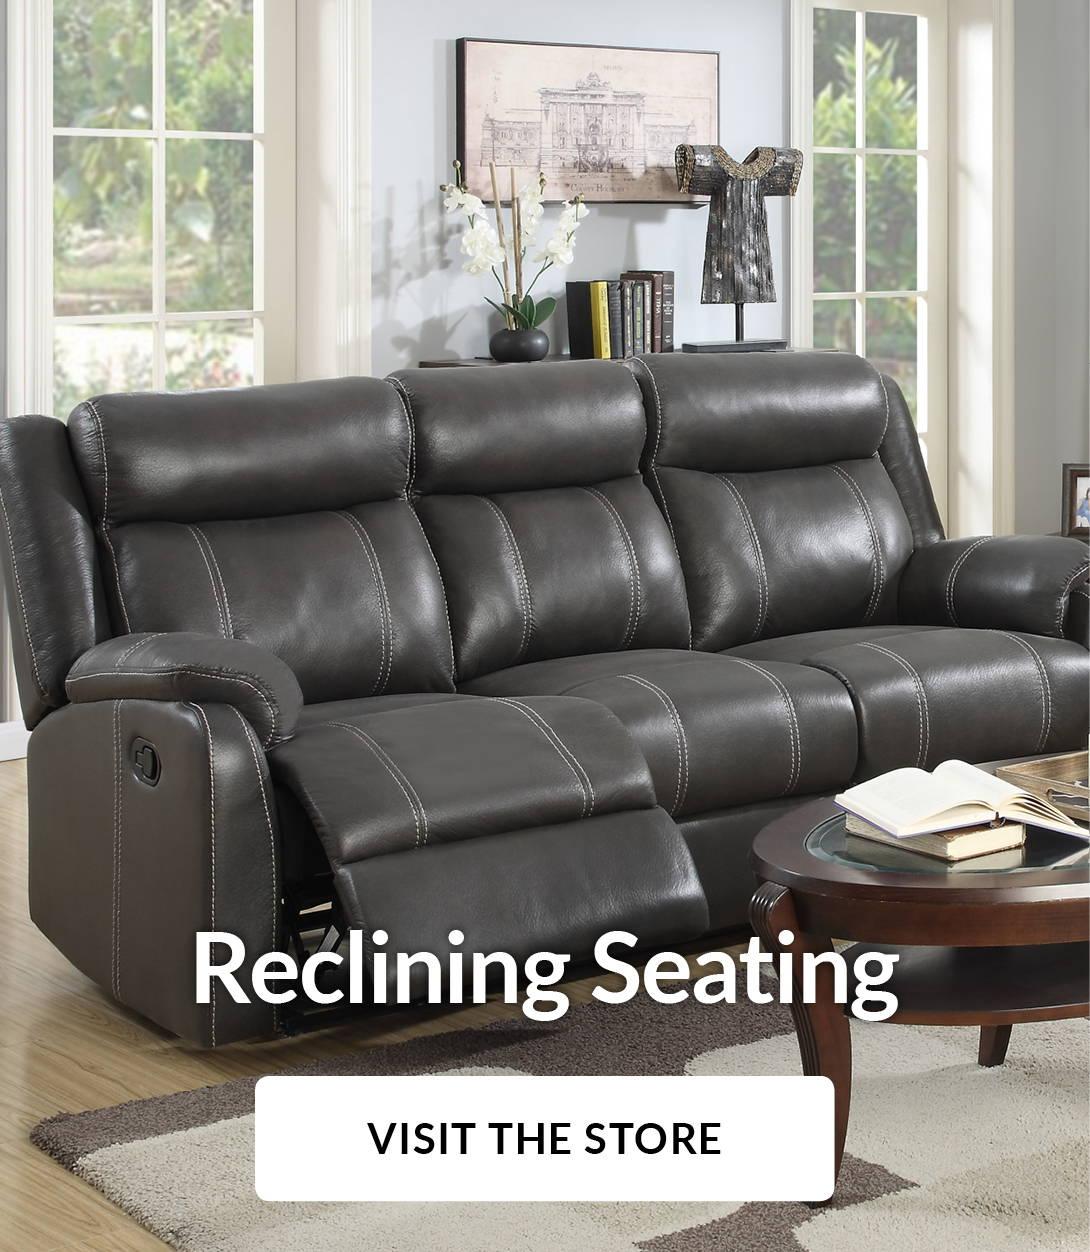 Reclining Seating